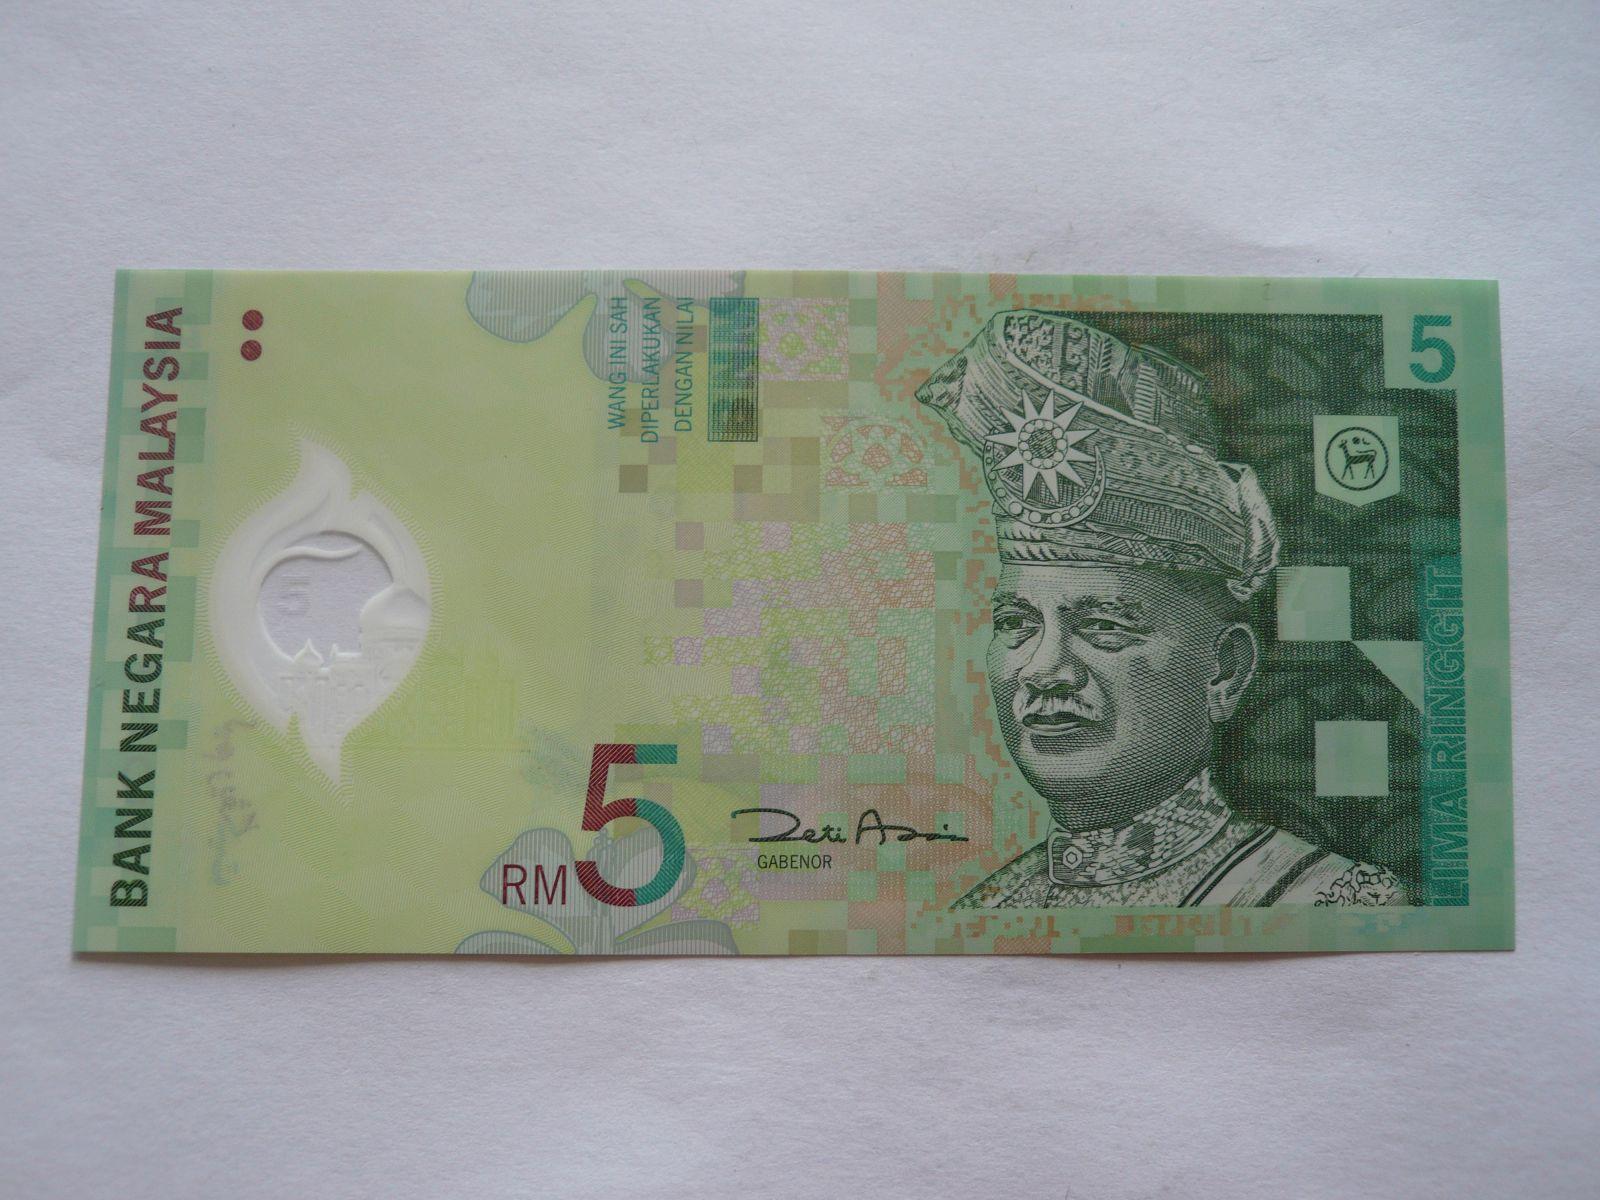 5 Rupies, Gabenor-zelená, Malaysie